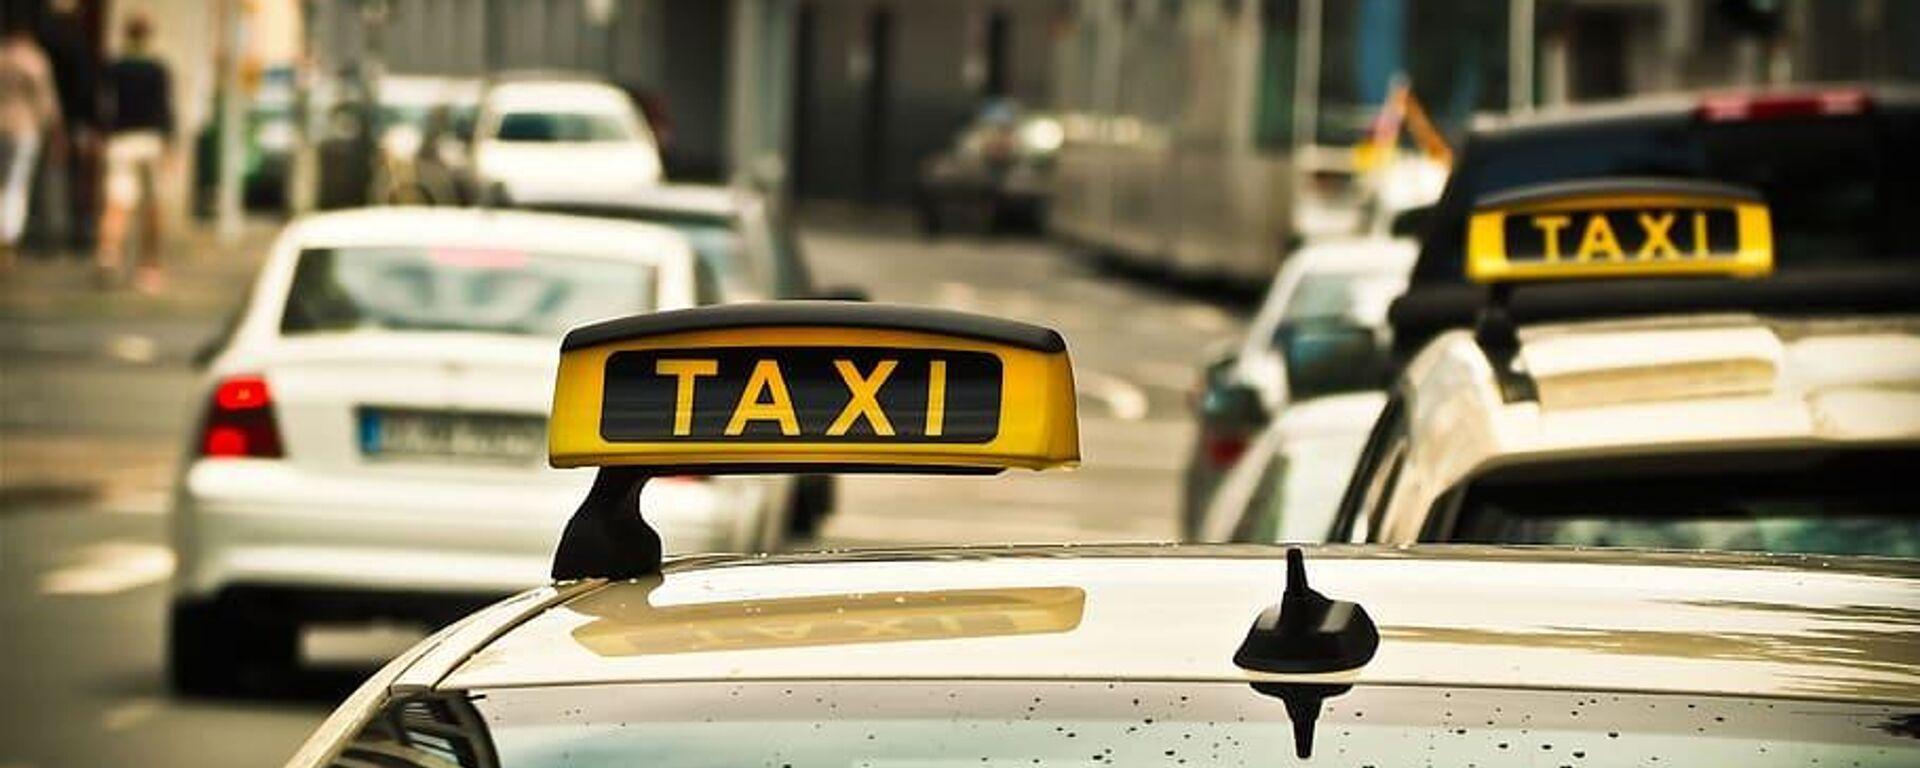 Taxi (Symbolbild) - SNA, 1920, 21.07.2021